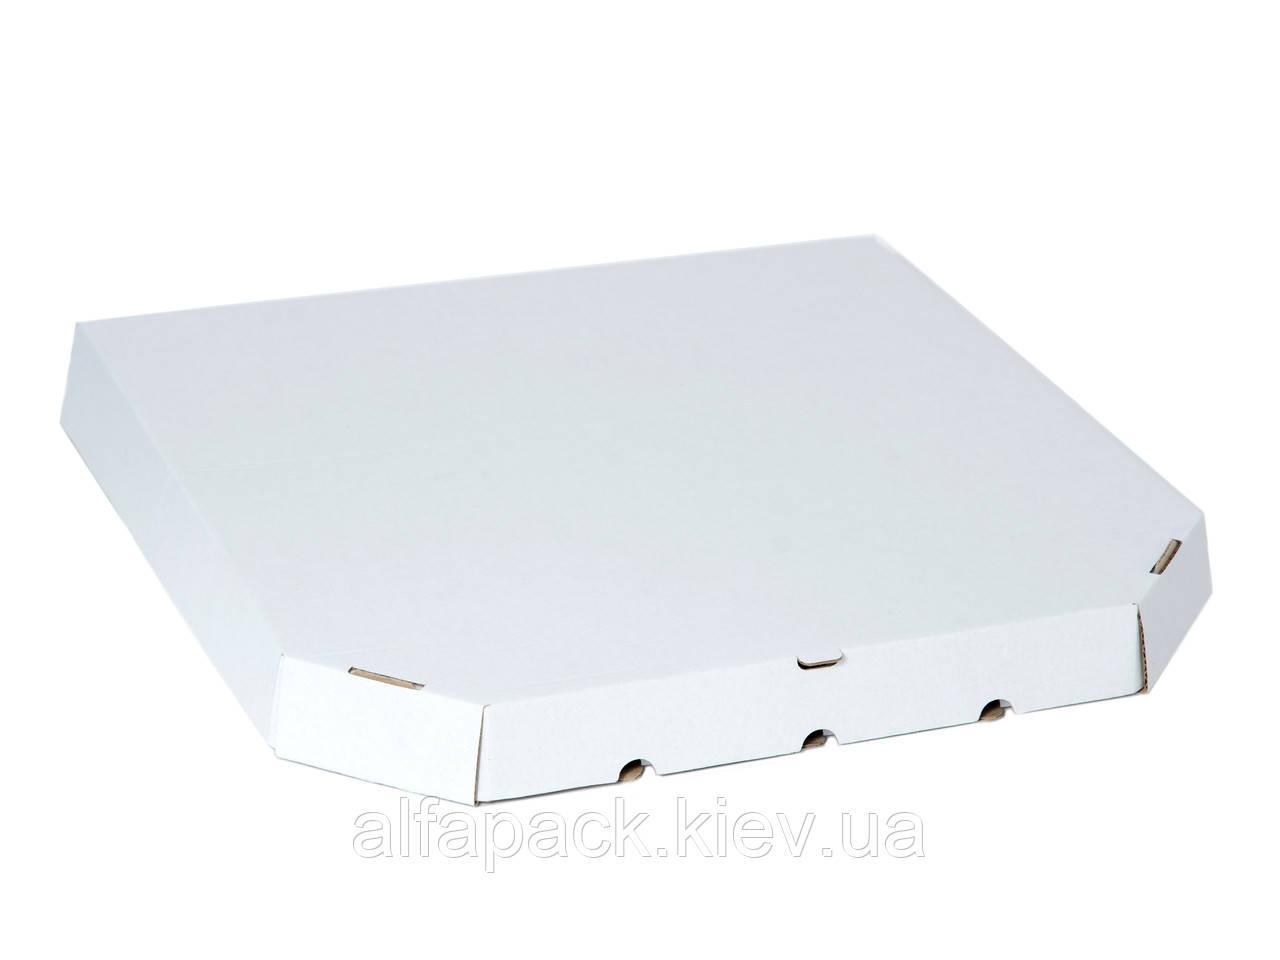 Коробка для пиццы белая D-35, 350х350х37 мм